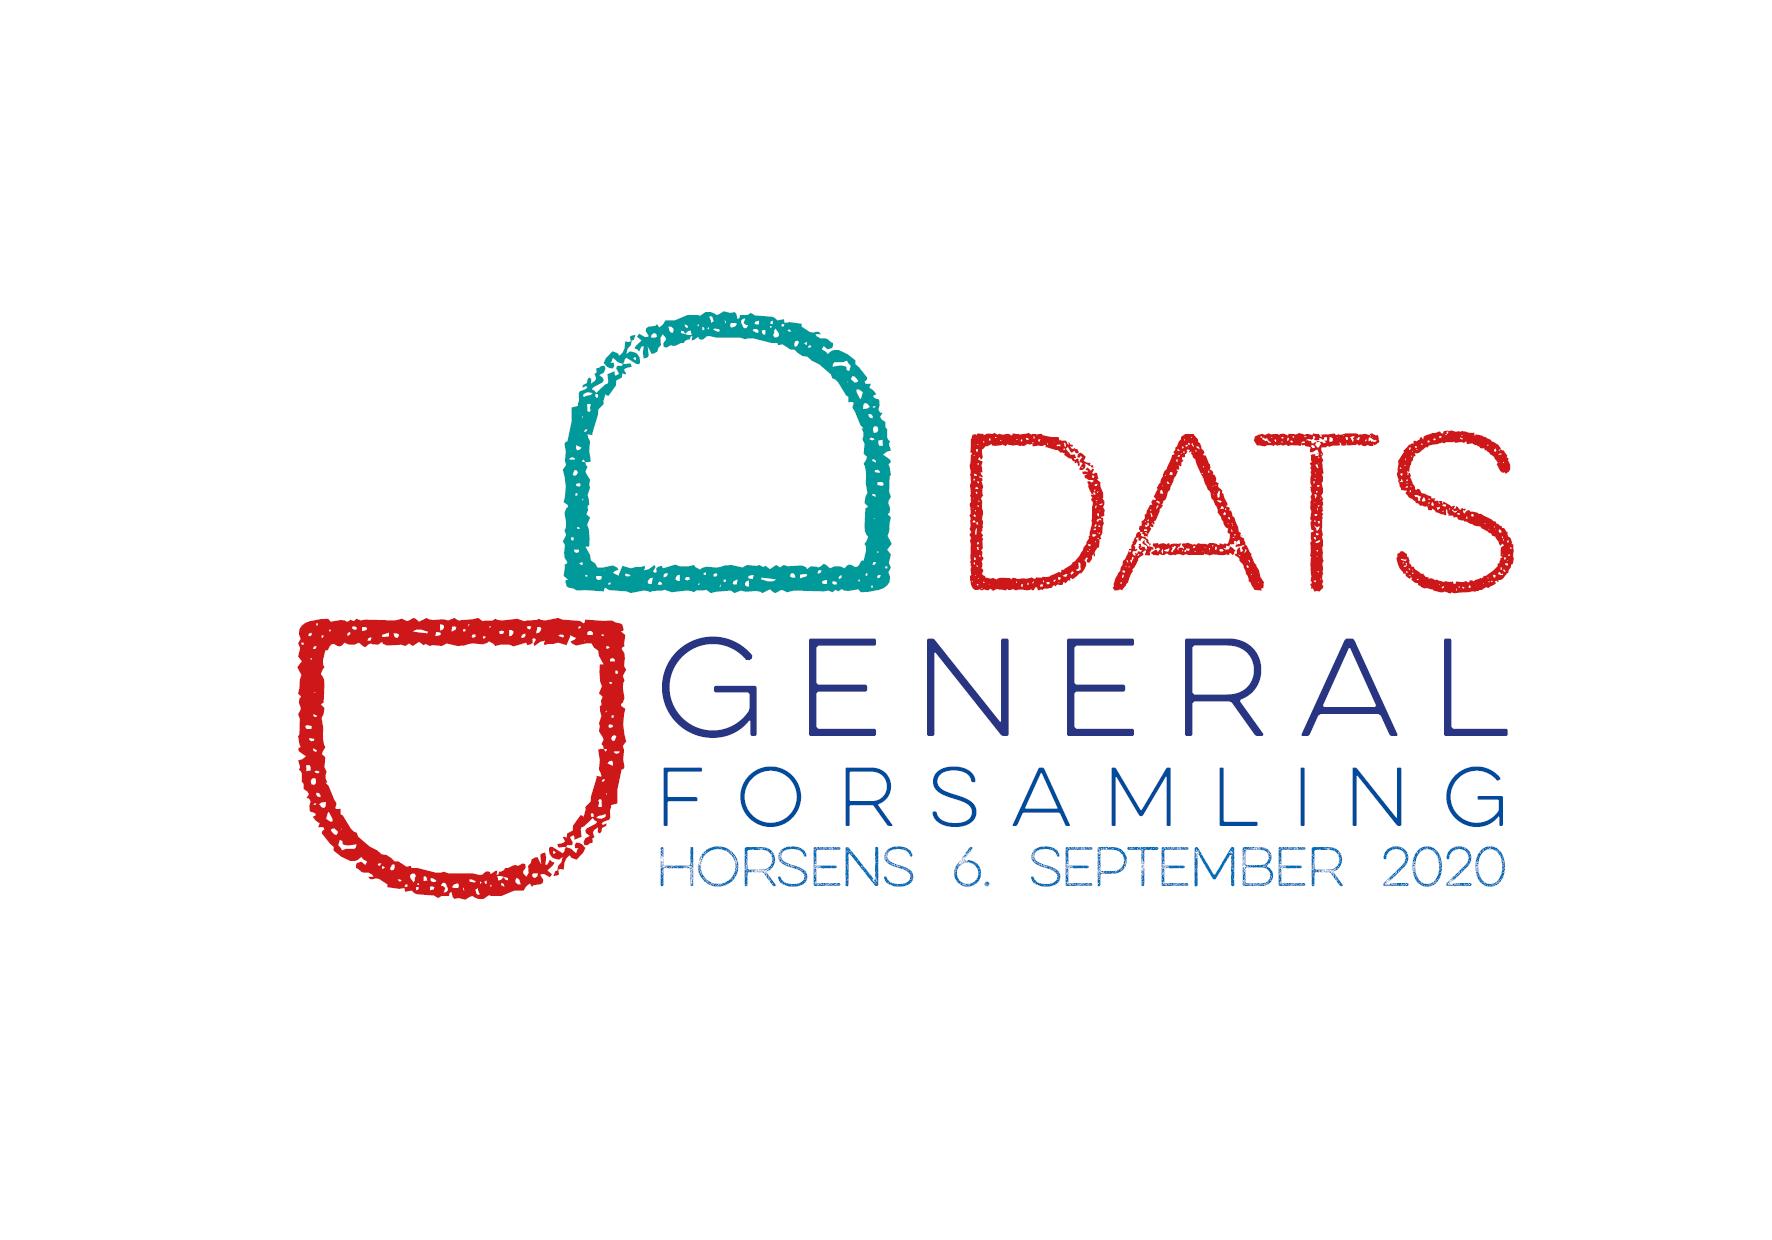 DATS Generalforsamling Horsens_06.09.20